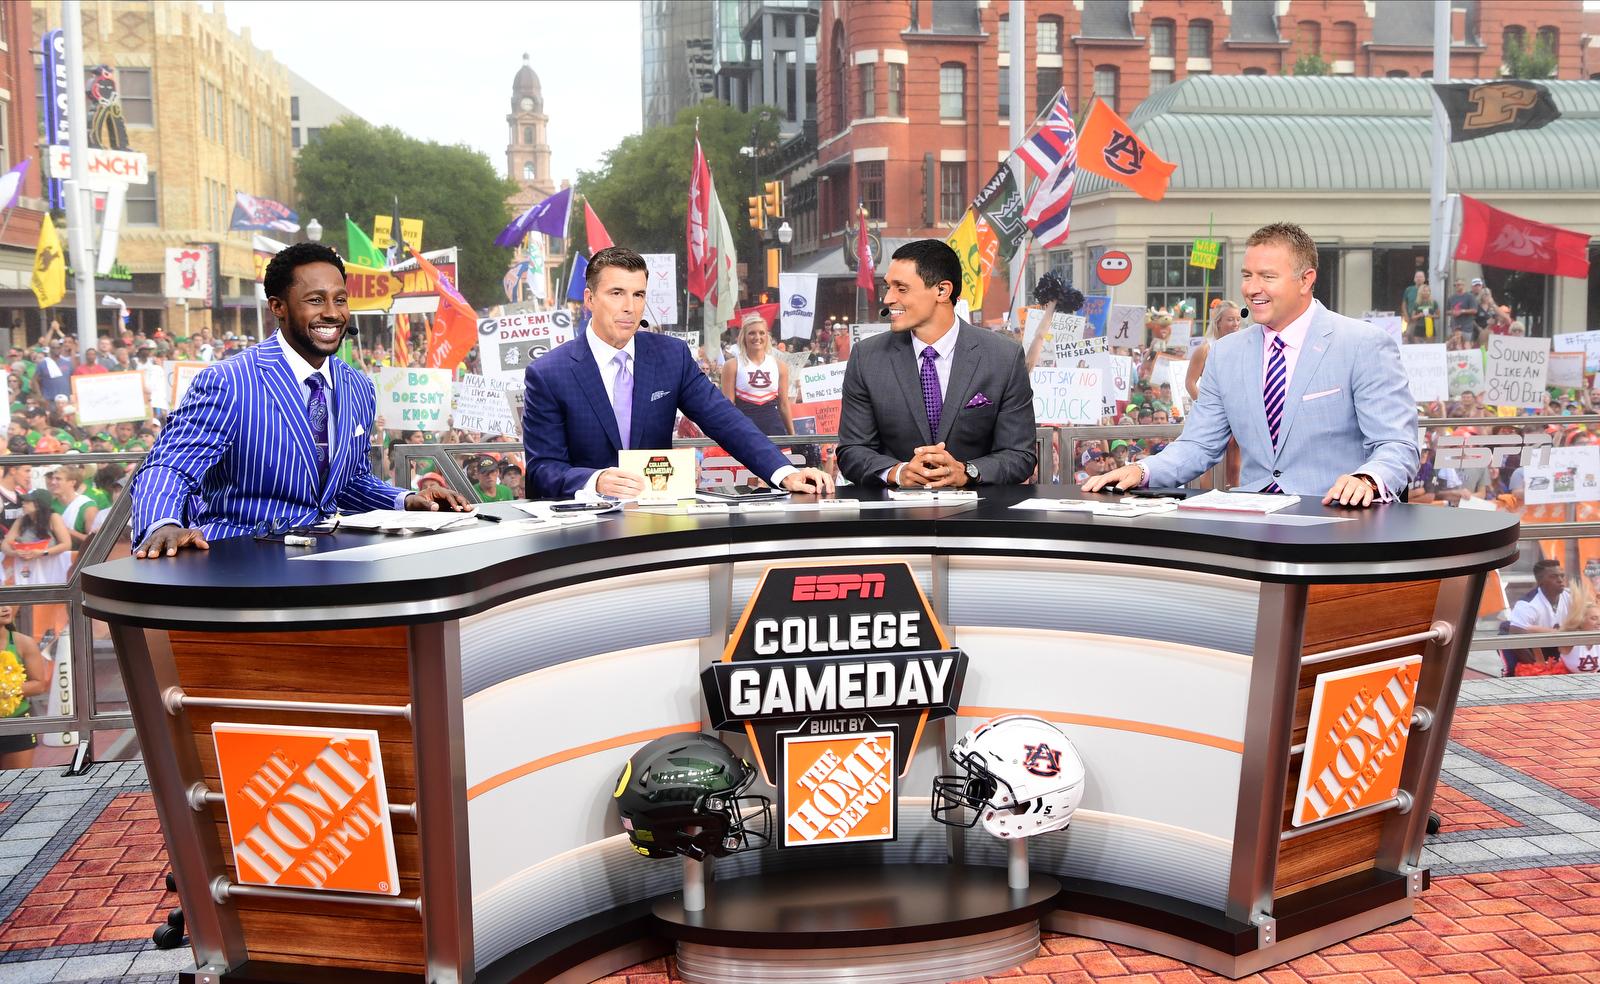 NCS_ESPN-College-Gameday_0001